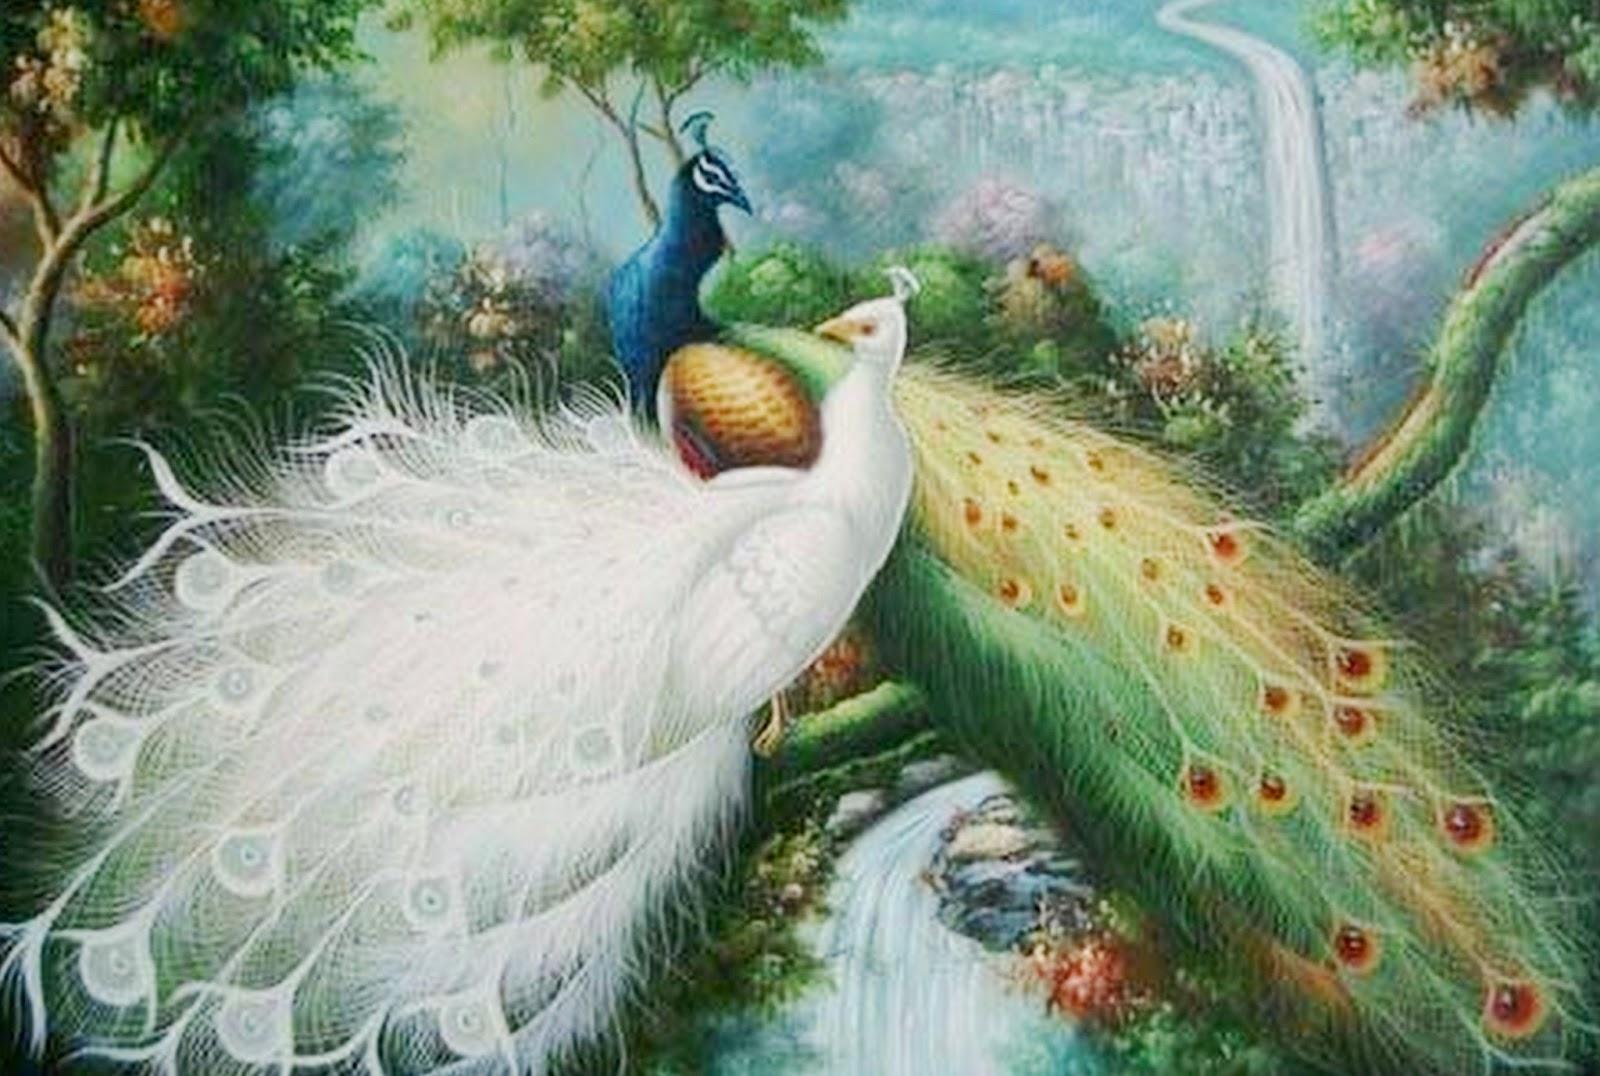 best Imagenes De Aves Para Pintar Al Oleo image collection